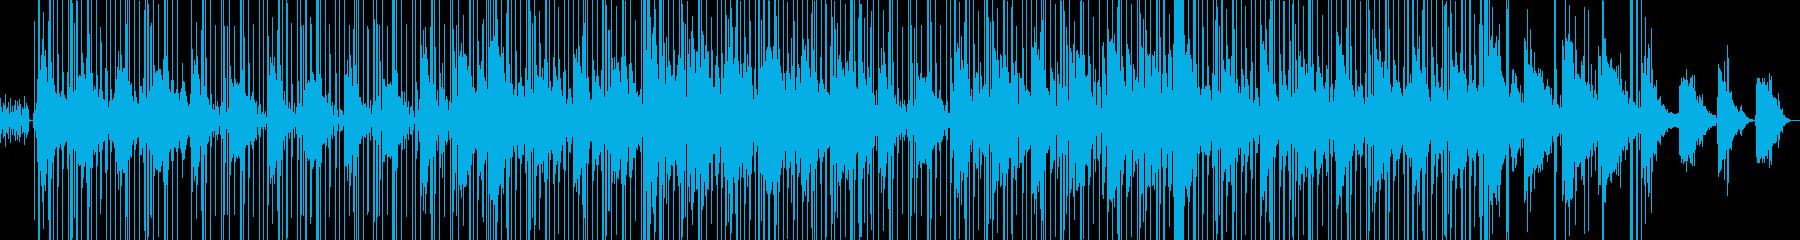 JIINO/色気のあるピアノHIPHOPの再生済みの波形